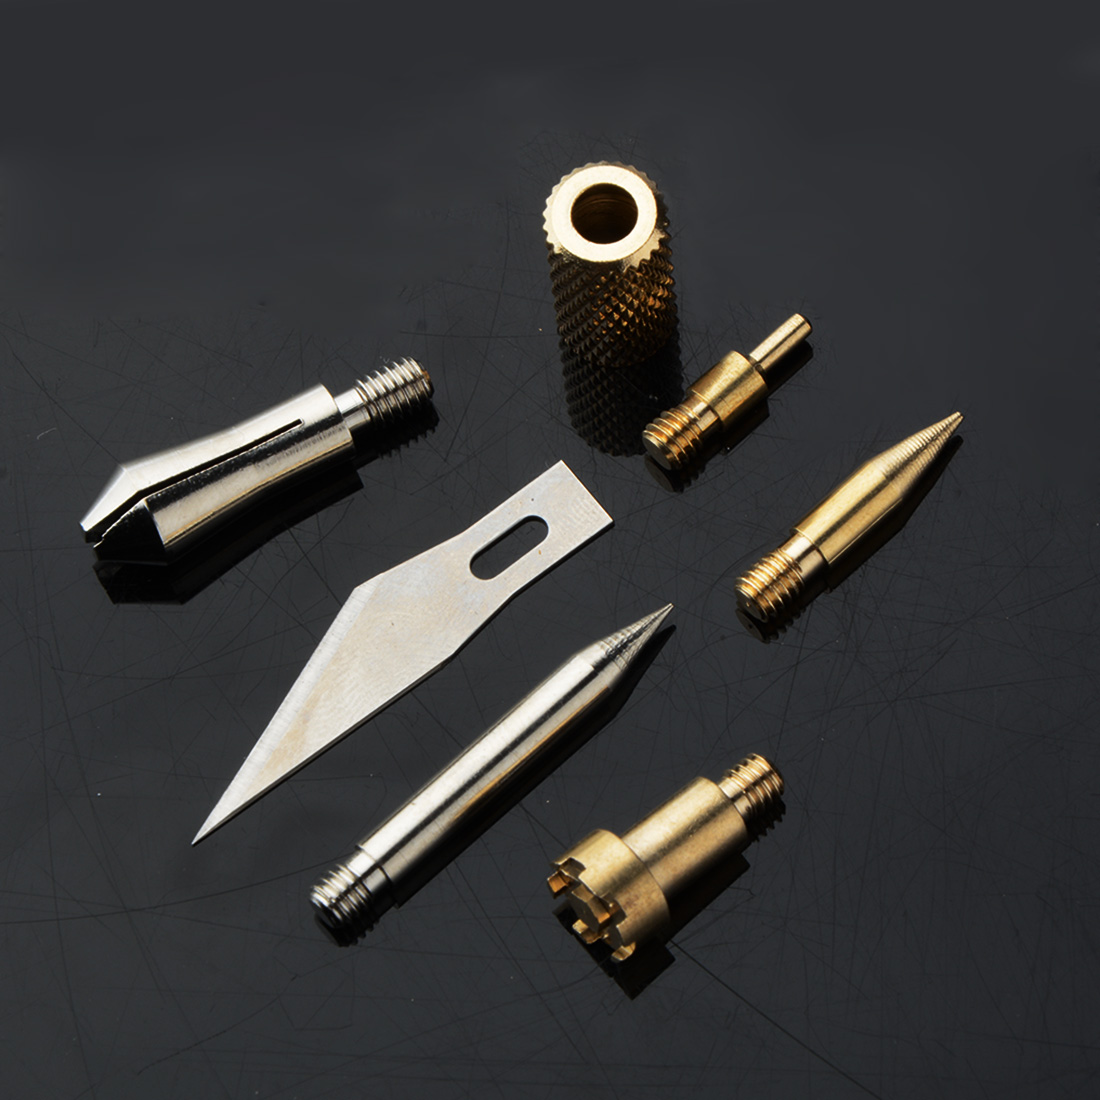 Tool 6 Pcs/ Set Wood Burning Pen Set Welding Tips & Stencil Set Soldering Iron Carving Tools For DIY